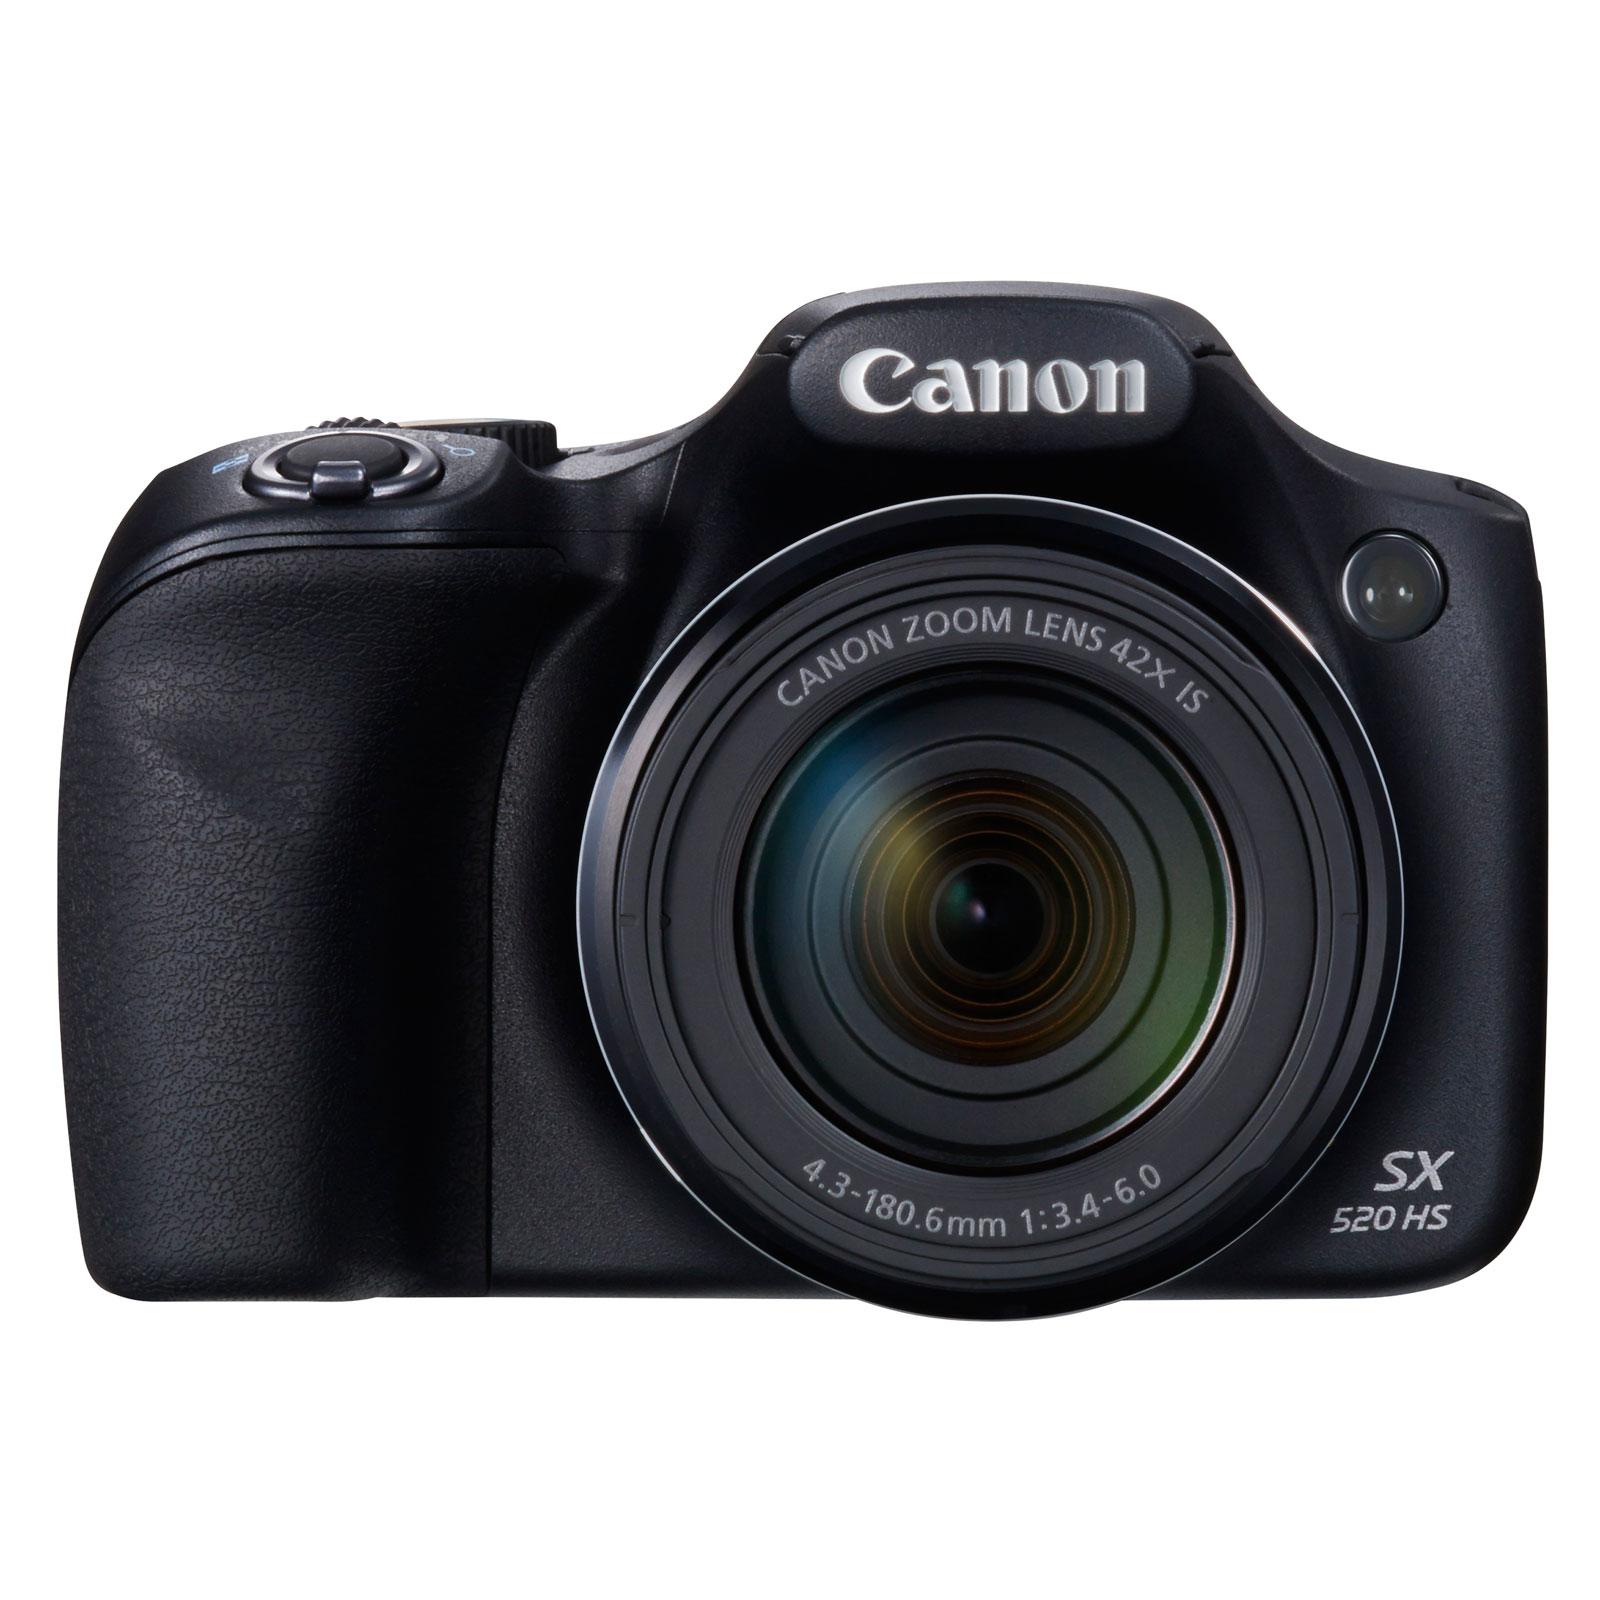 canon sx520 hs 9544b002 achat vente appareil photo. Black Bedroom Furniture Sets. Home Design Ideas